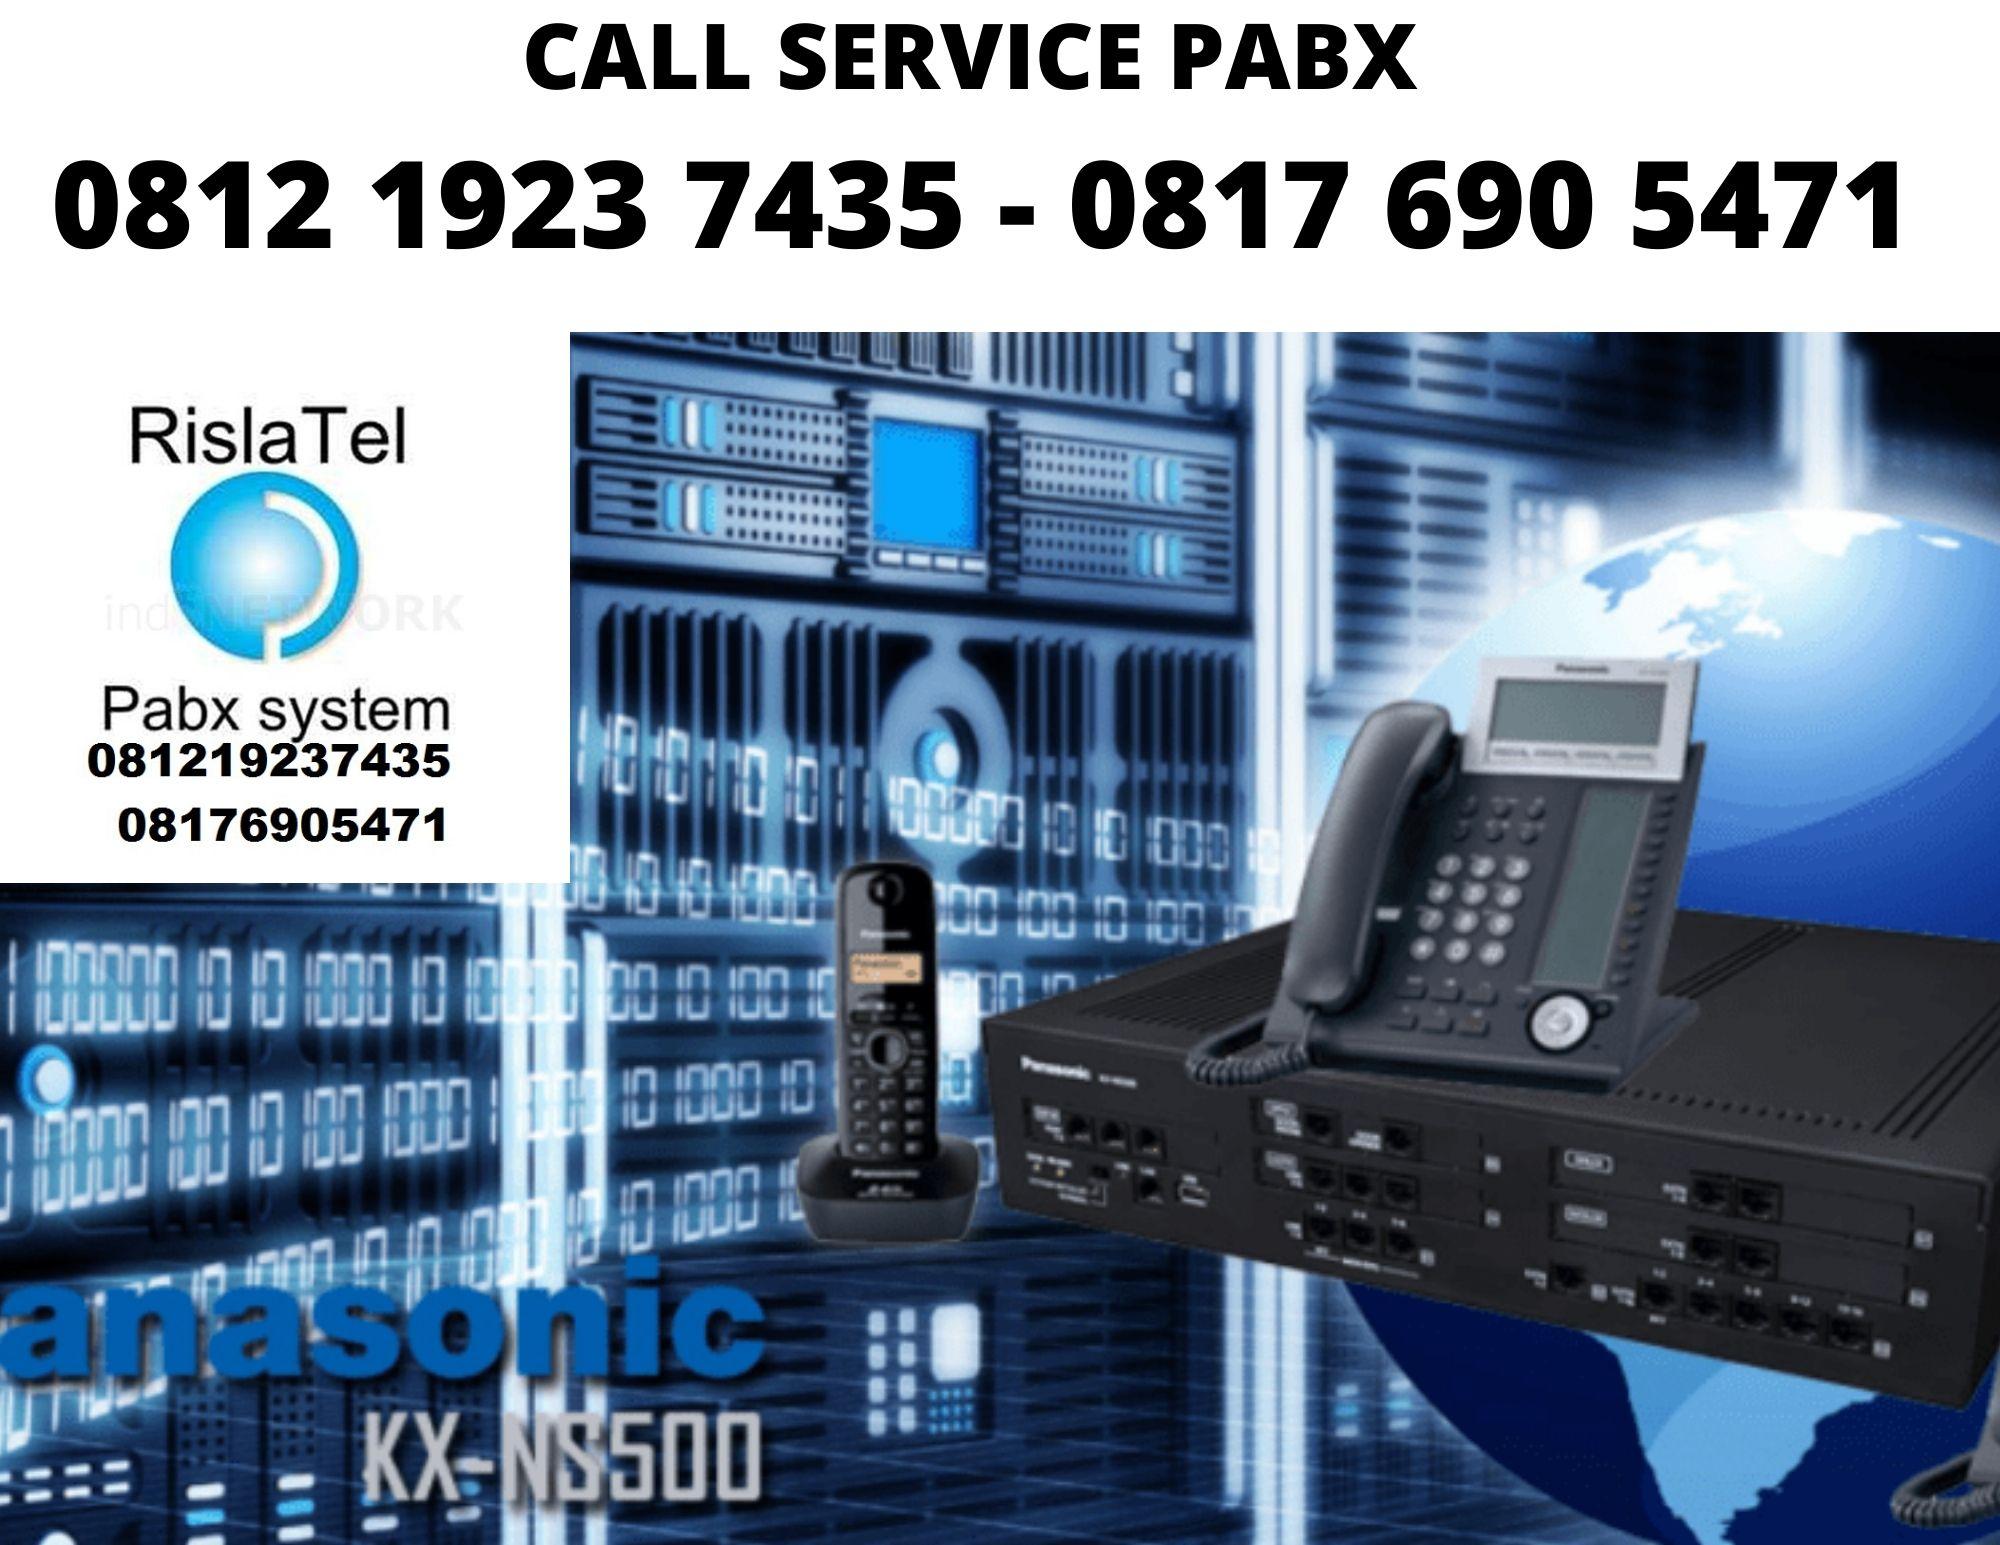 Call Service PABX